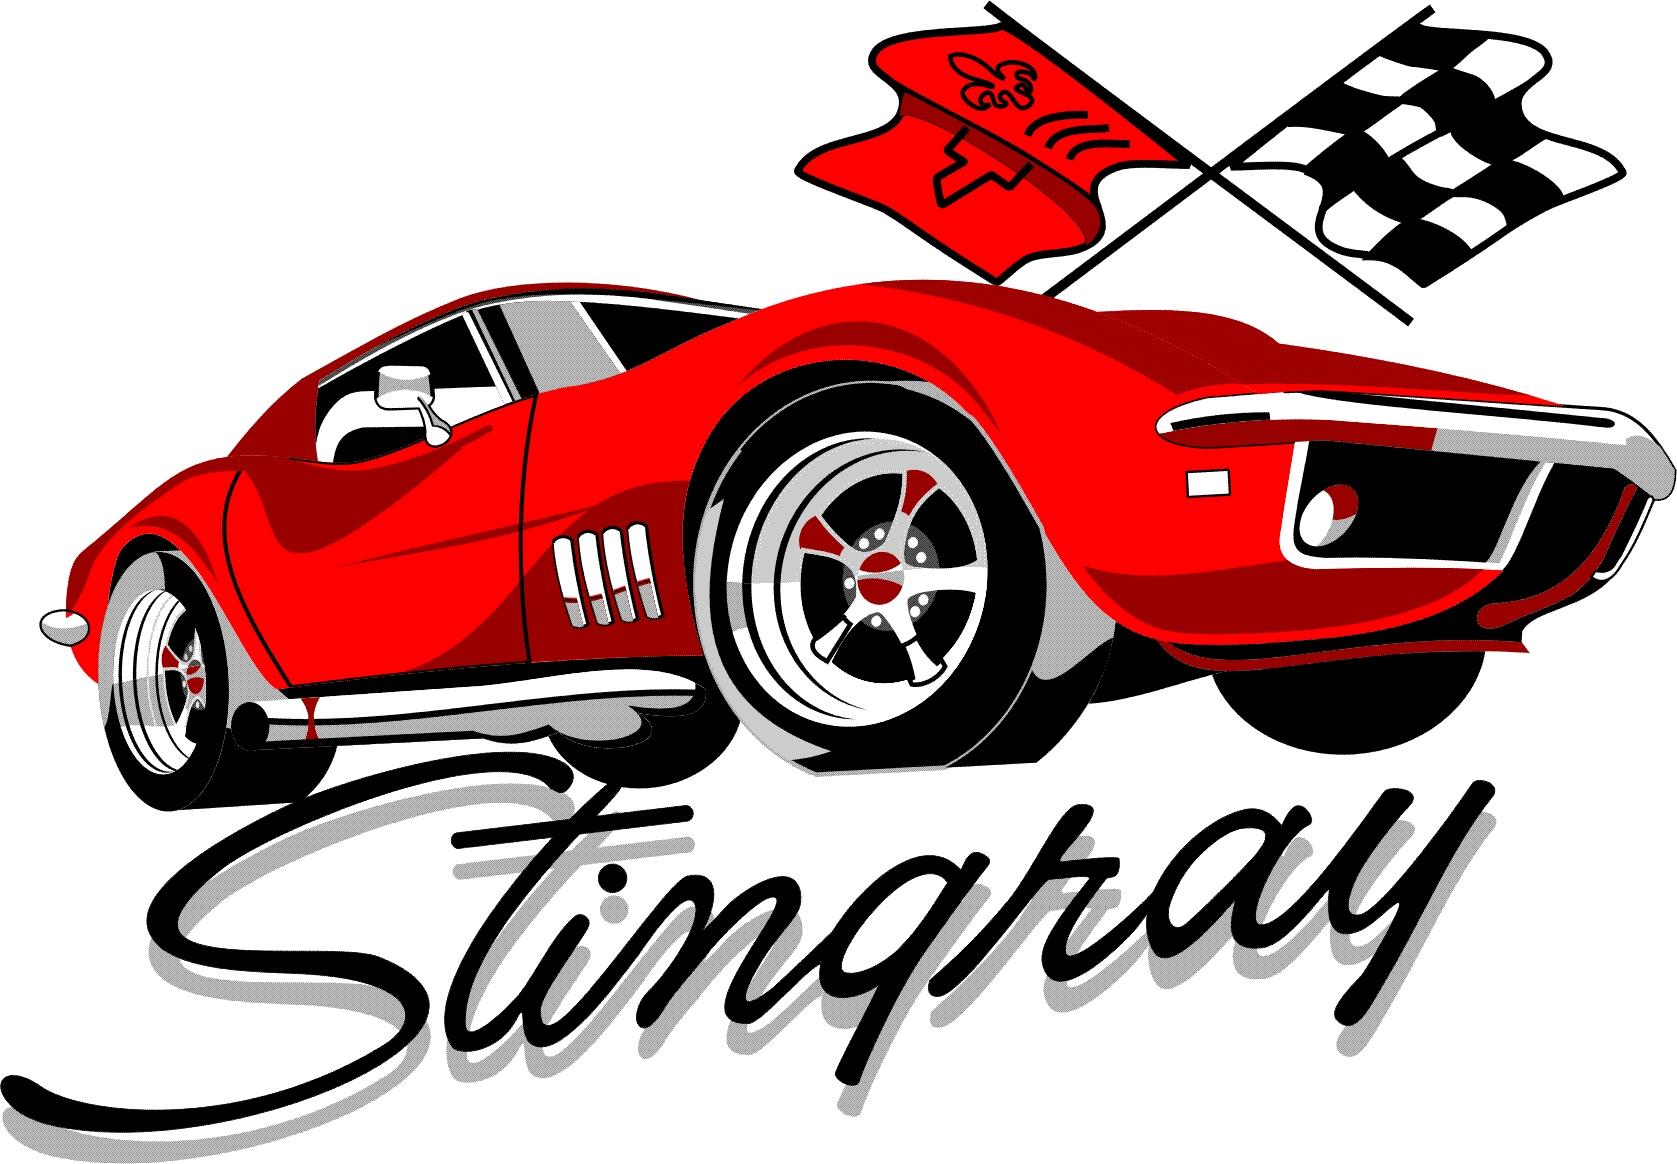 1677x1164 2014 Corvette C7 Stingray Clip Art Cliparts